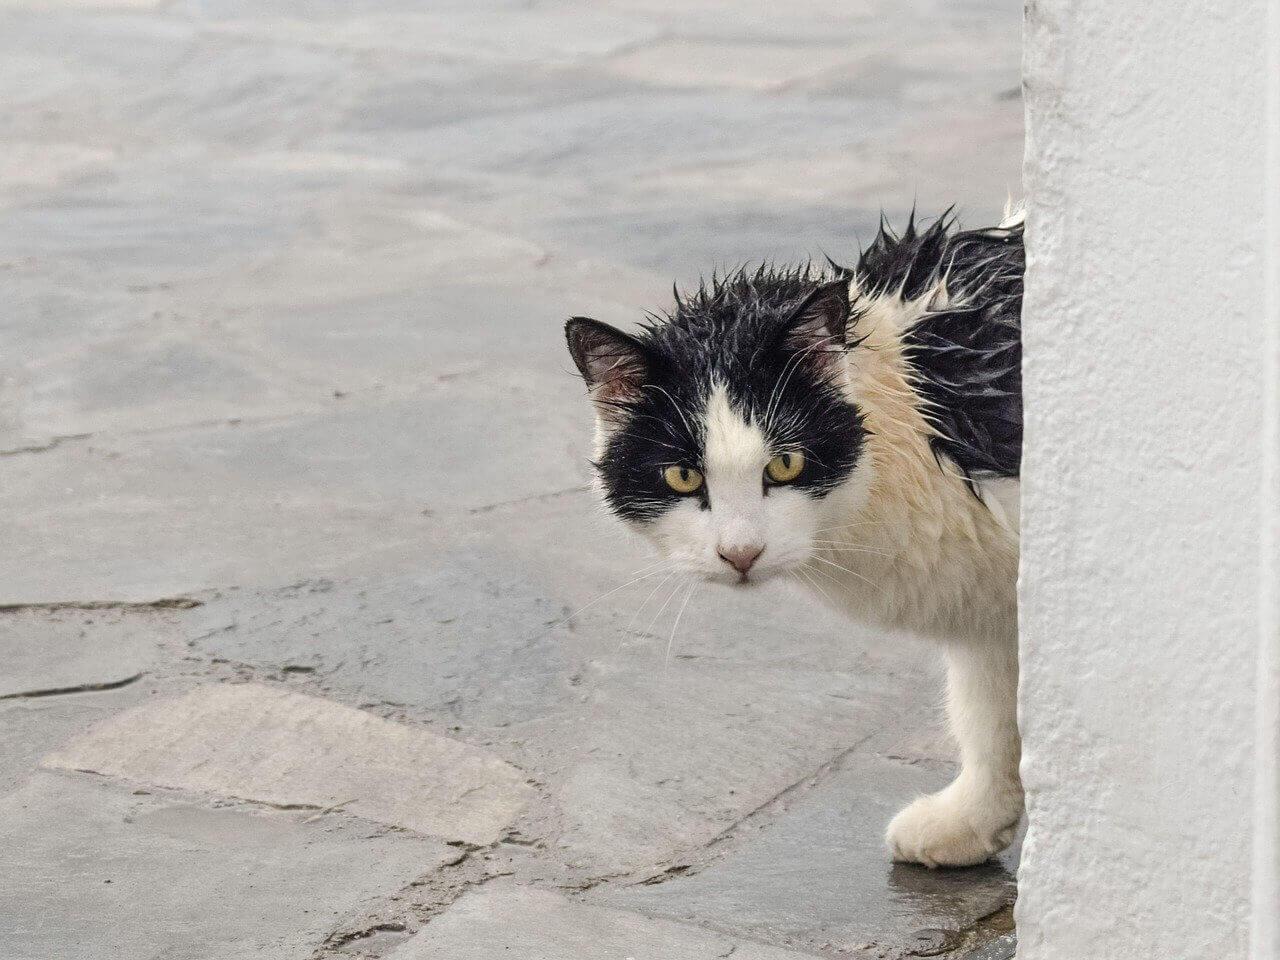 Cat with wet fur